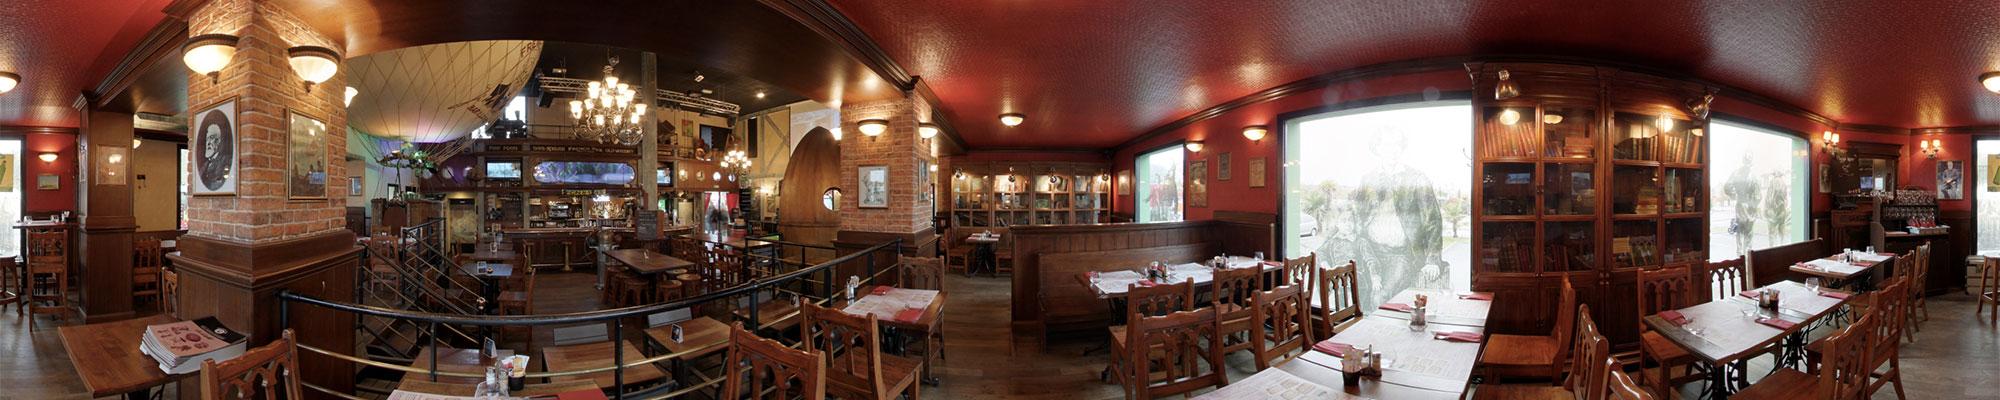 restaurant french pub nantes